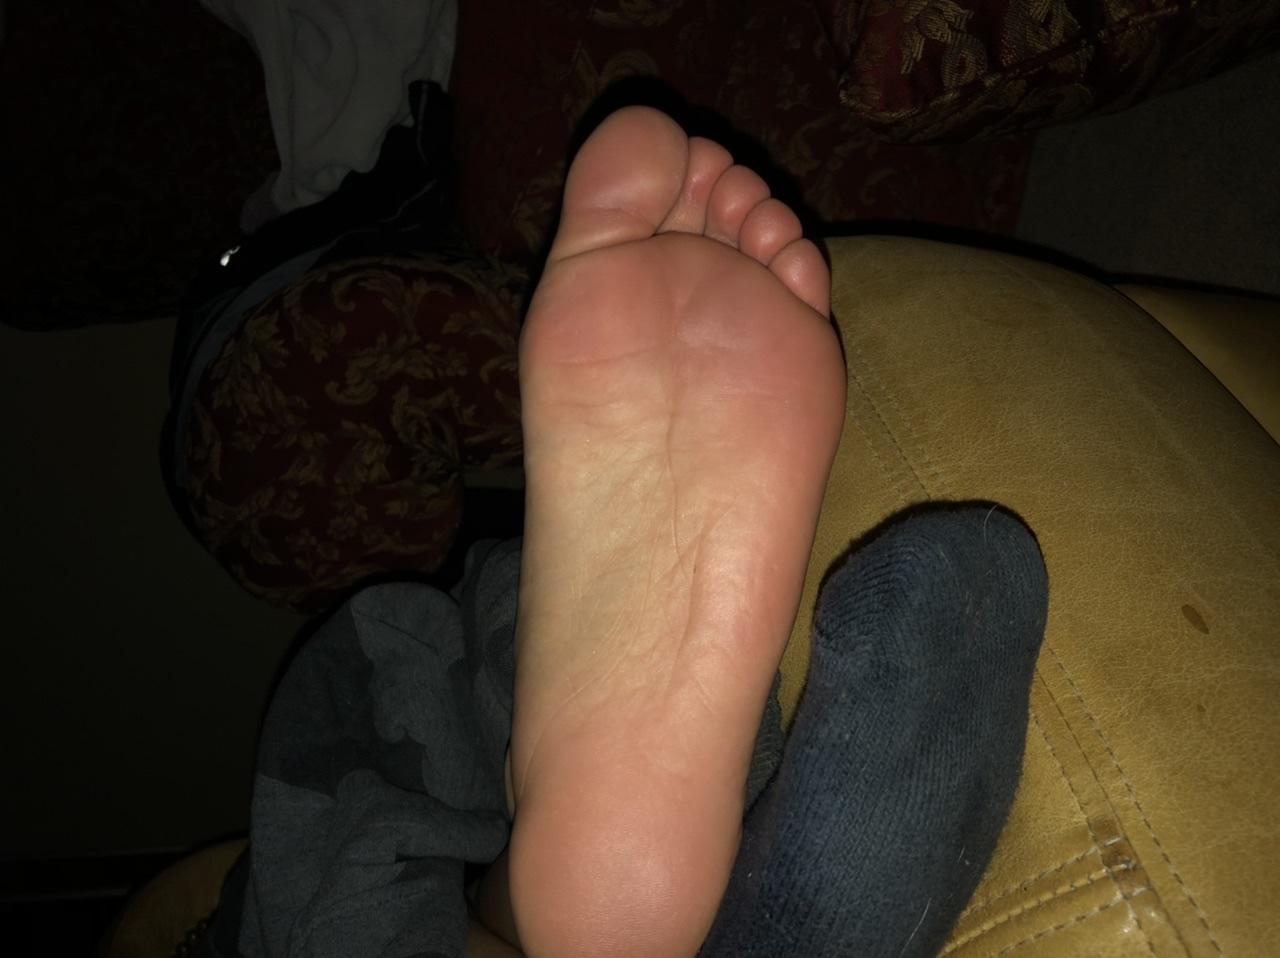 Mom feet story My Moms Feet By Qilffq On Deviantart